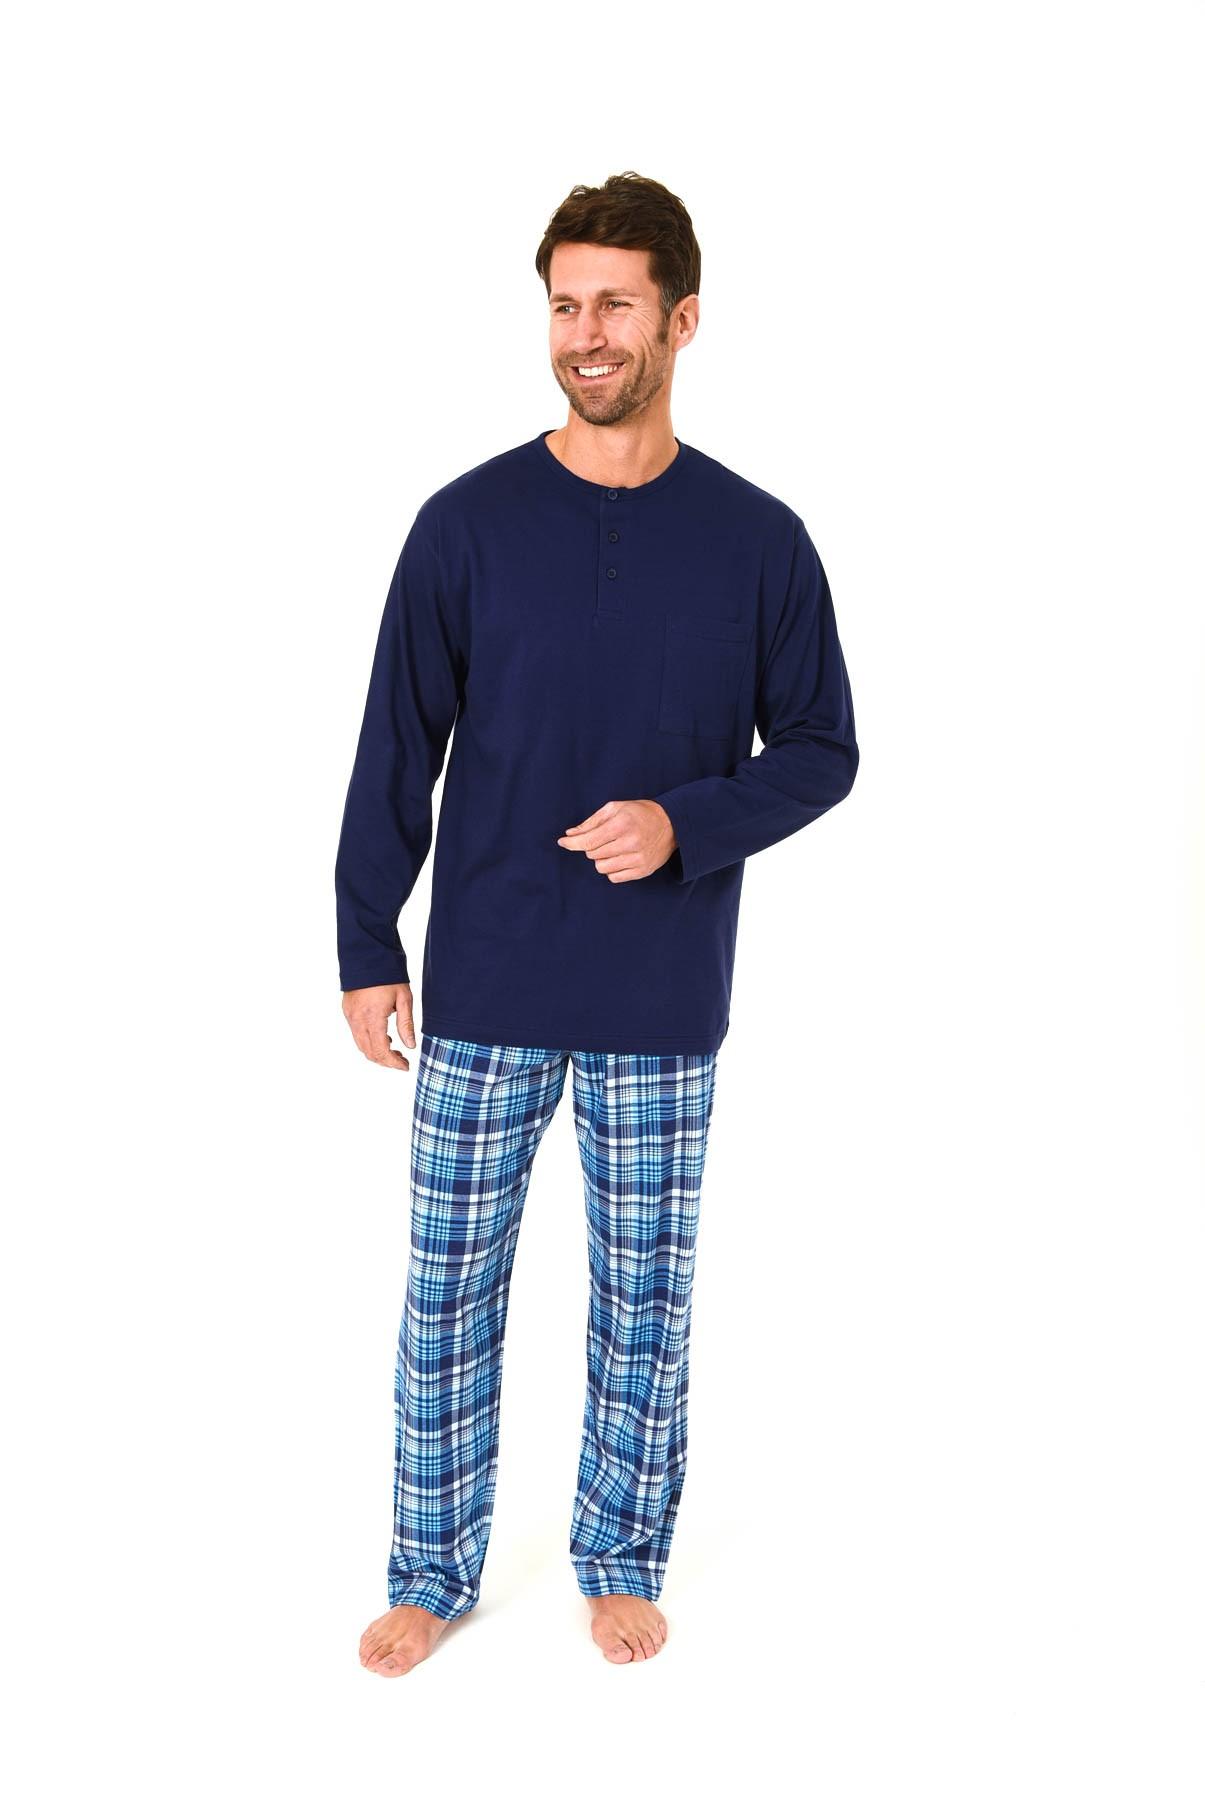 Lässiger Herren Pyjama langarm karierte Hose aus Single Jersey – 58557